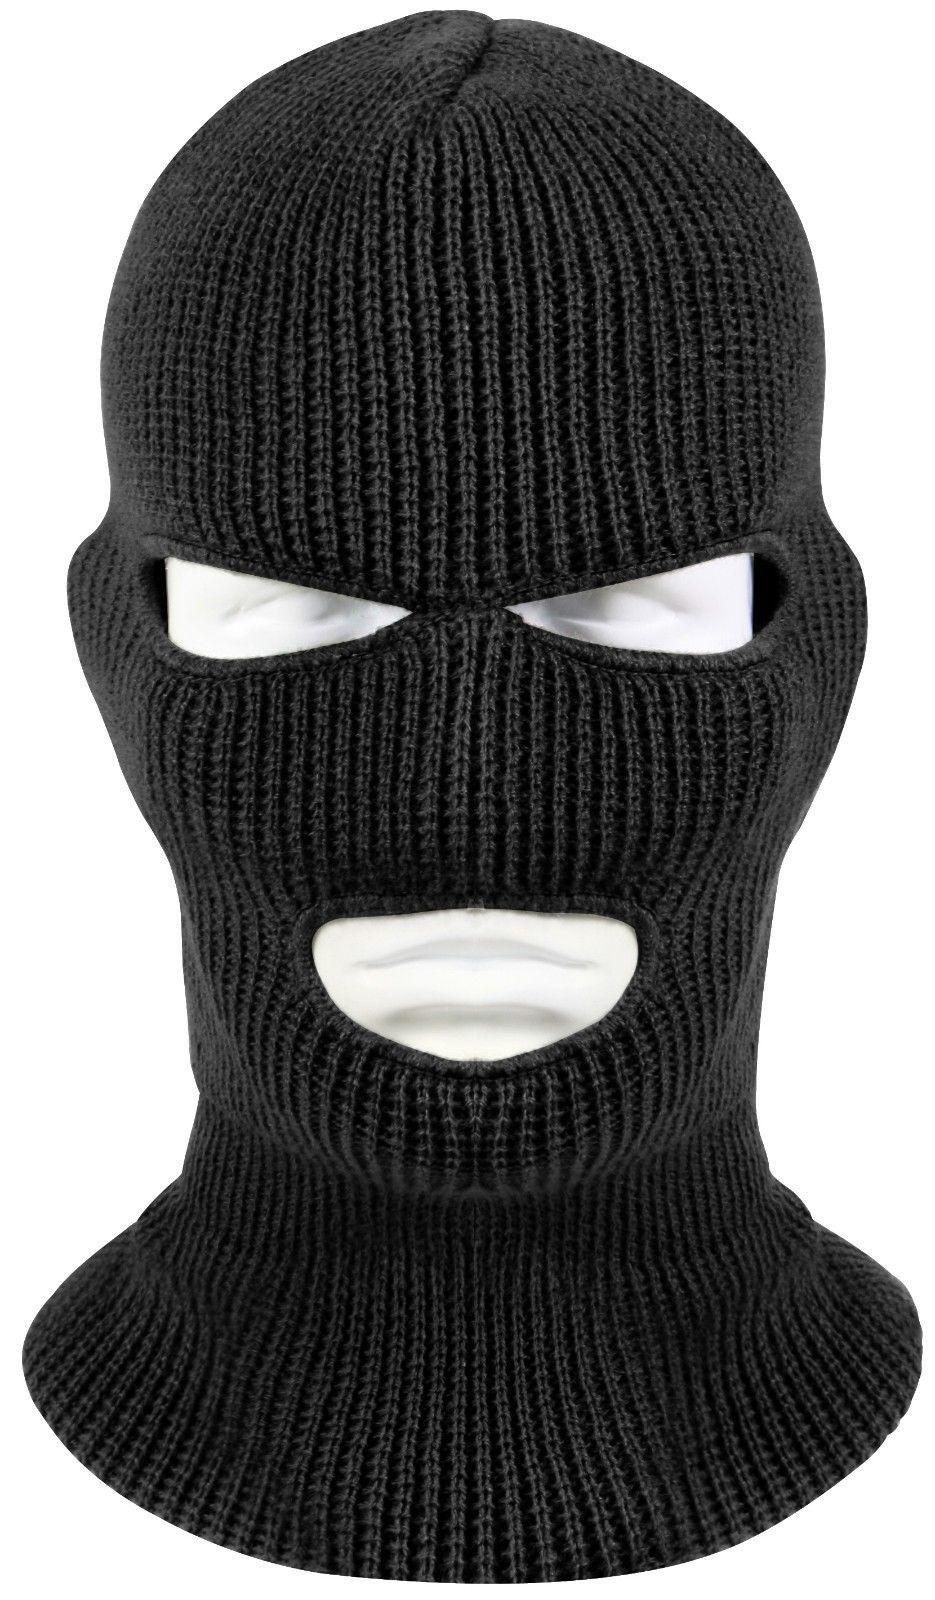 3 Hole Face Mask Ski Mask Winter Cap Balaclava Hood Army Tactical ...